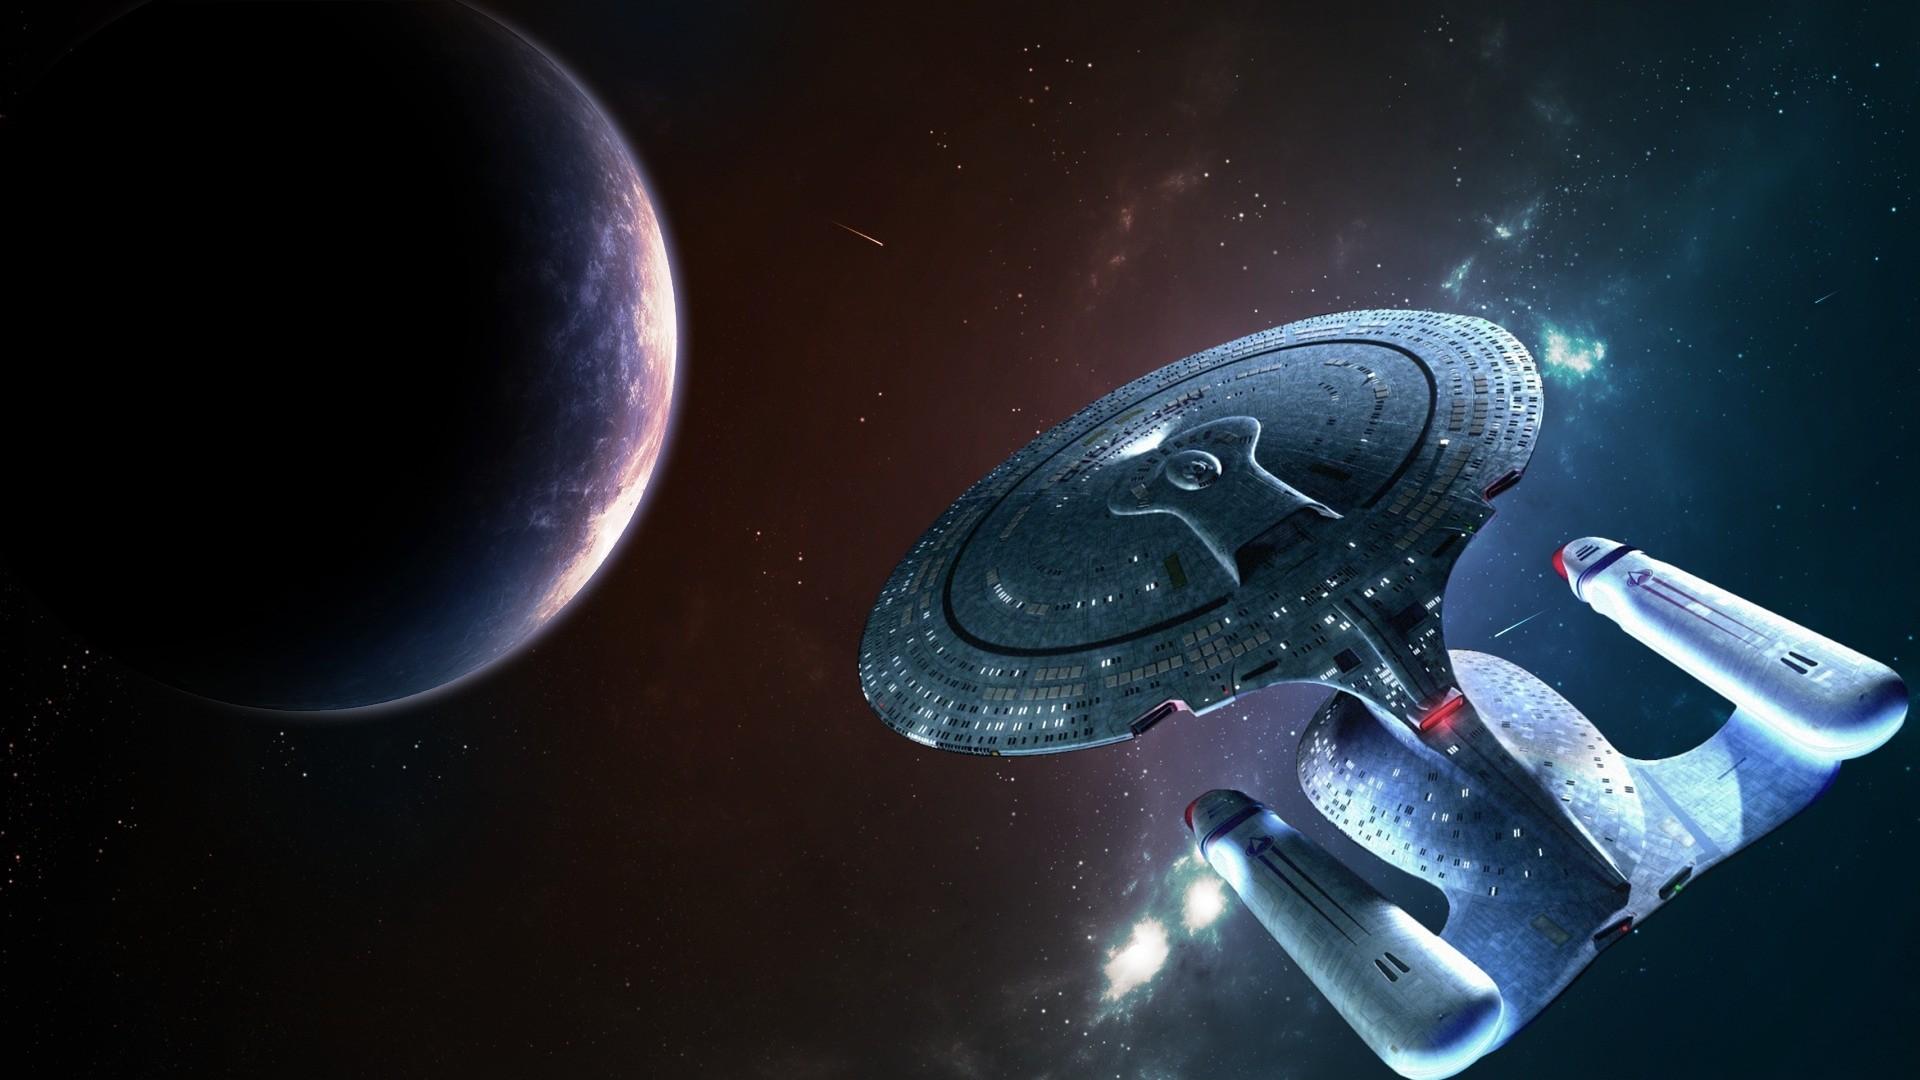 Star Trek The Next Generation Hd Wallpaper Background